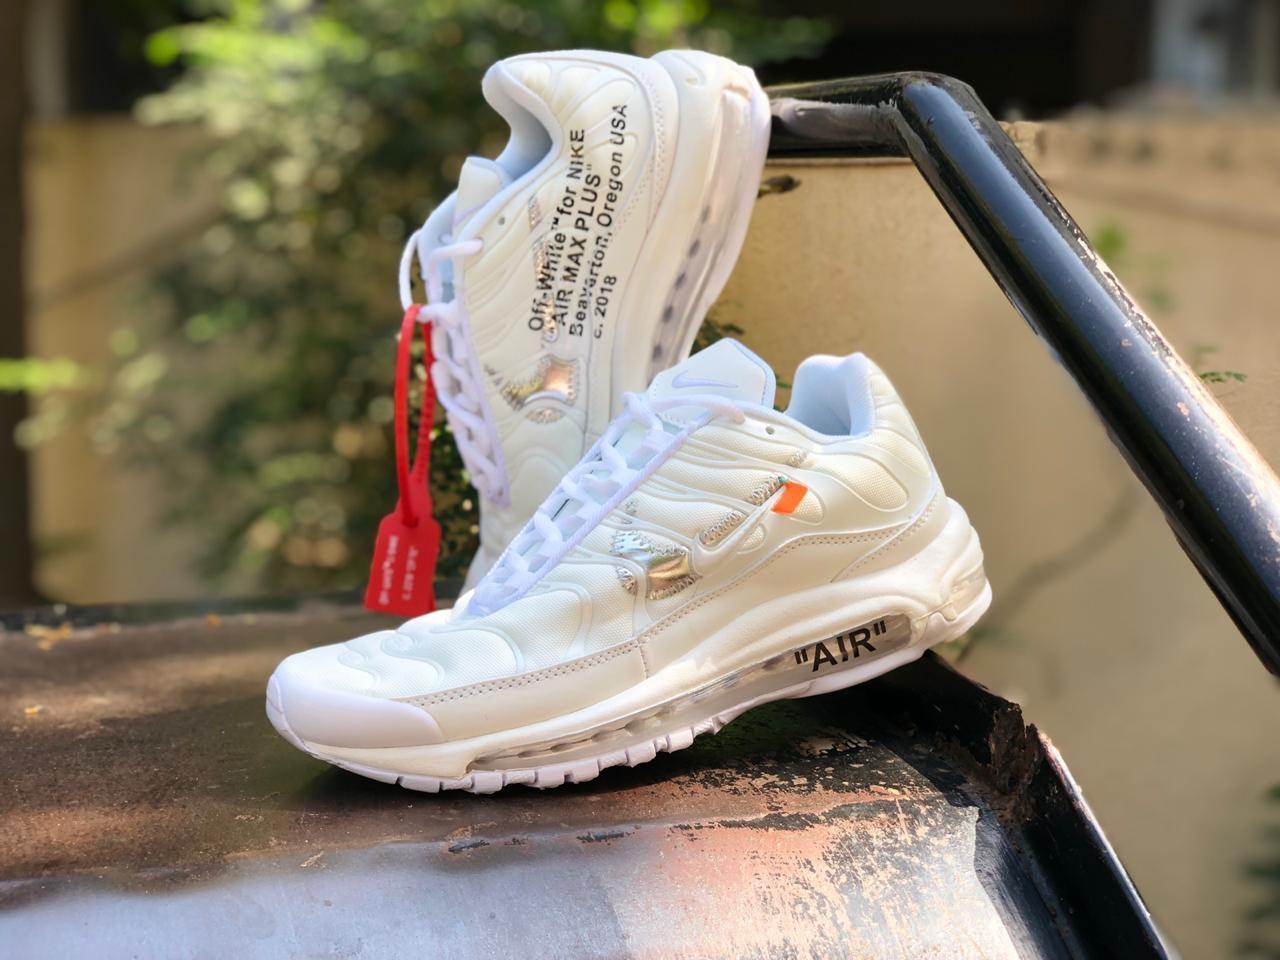 on sale c5de0 89b34 Off-White X Air Max 97 Plus TN 2019 Sneakers